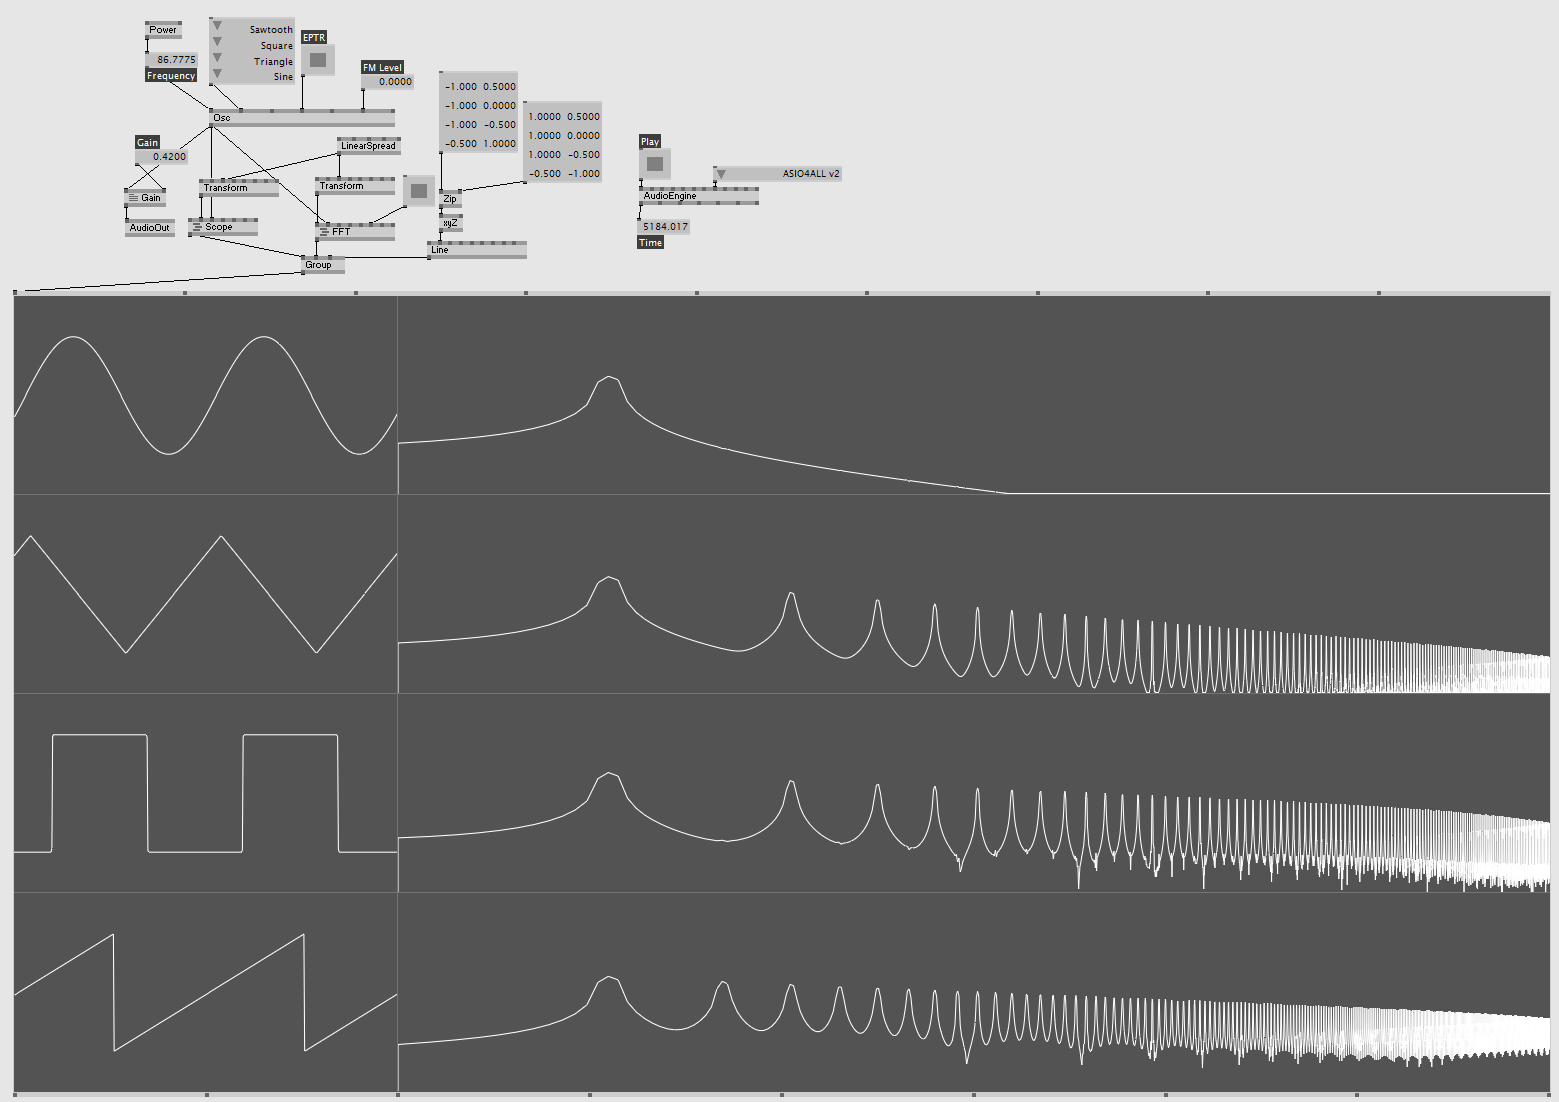 Eptr Pulse And Ltr Antialiasing Oscillators Page 3 Kvr Audio Http Vvvvorg Blog